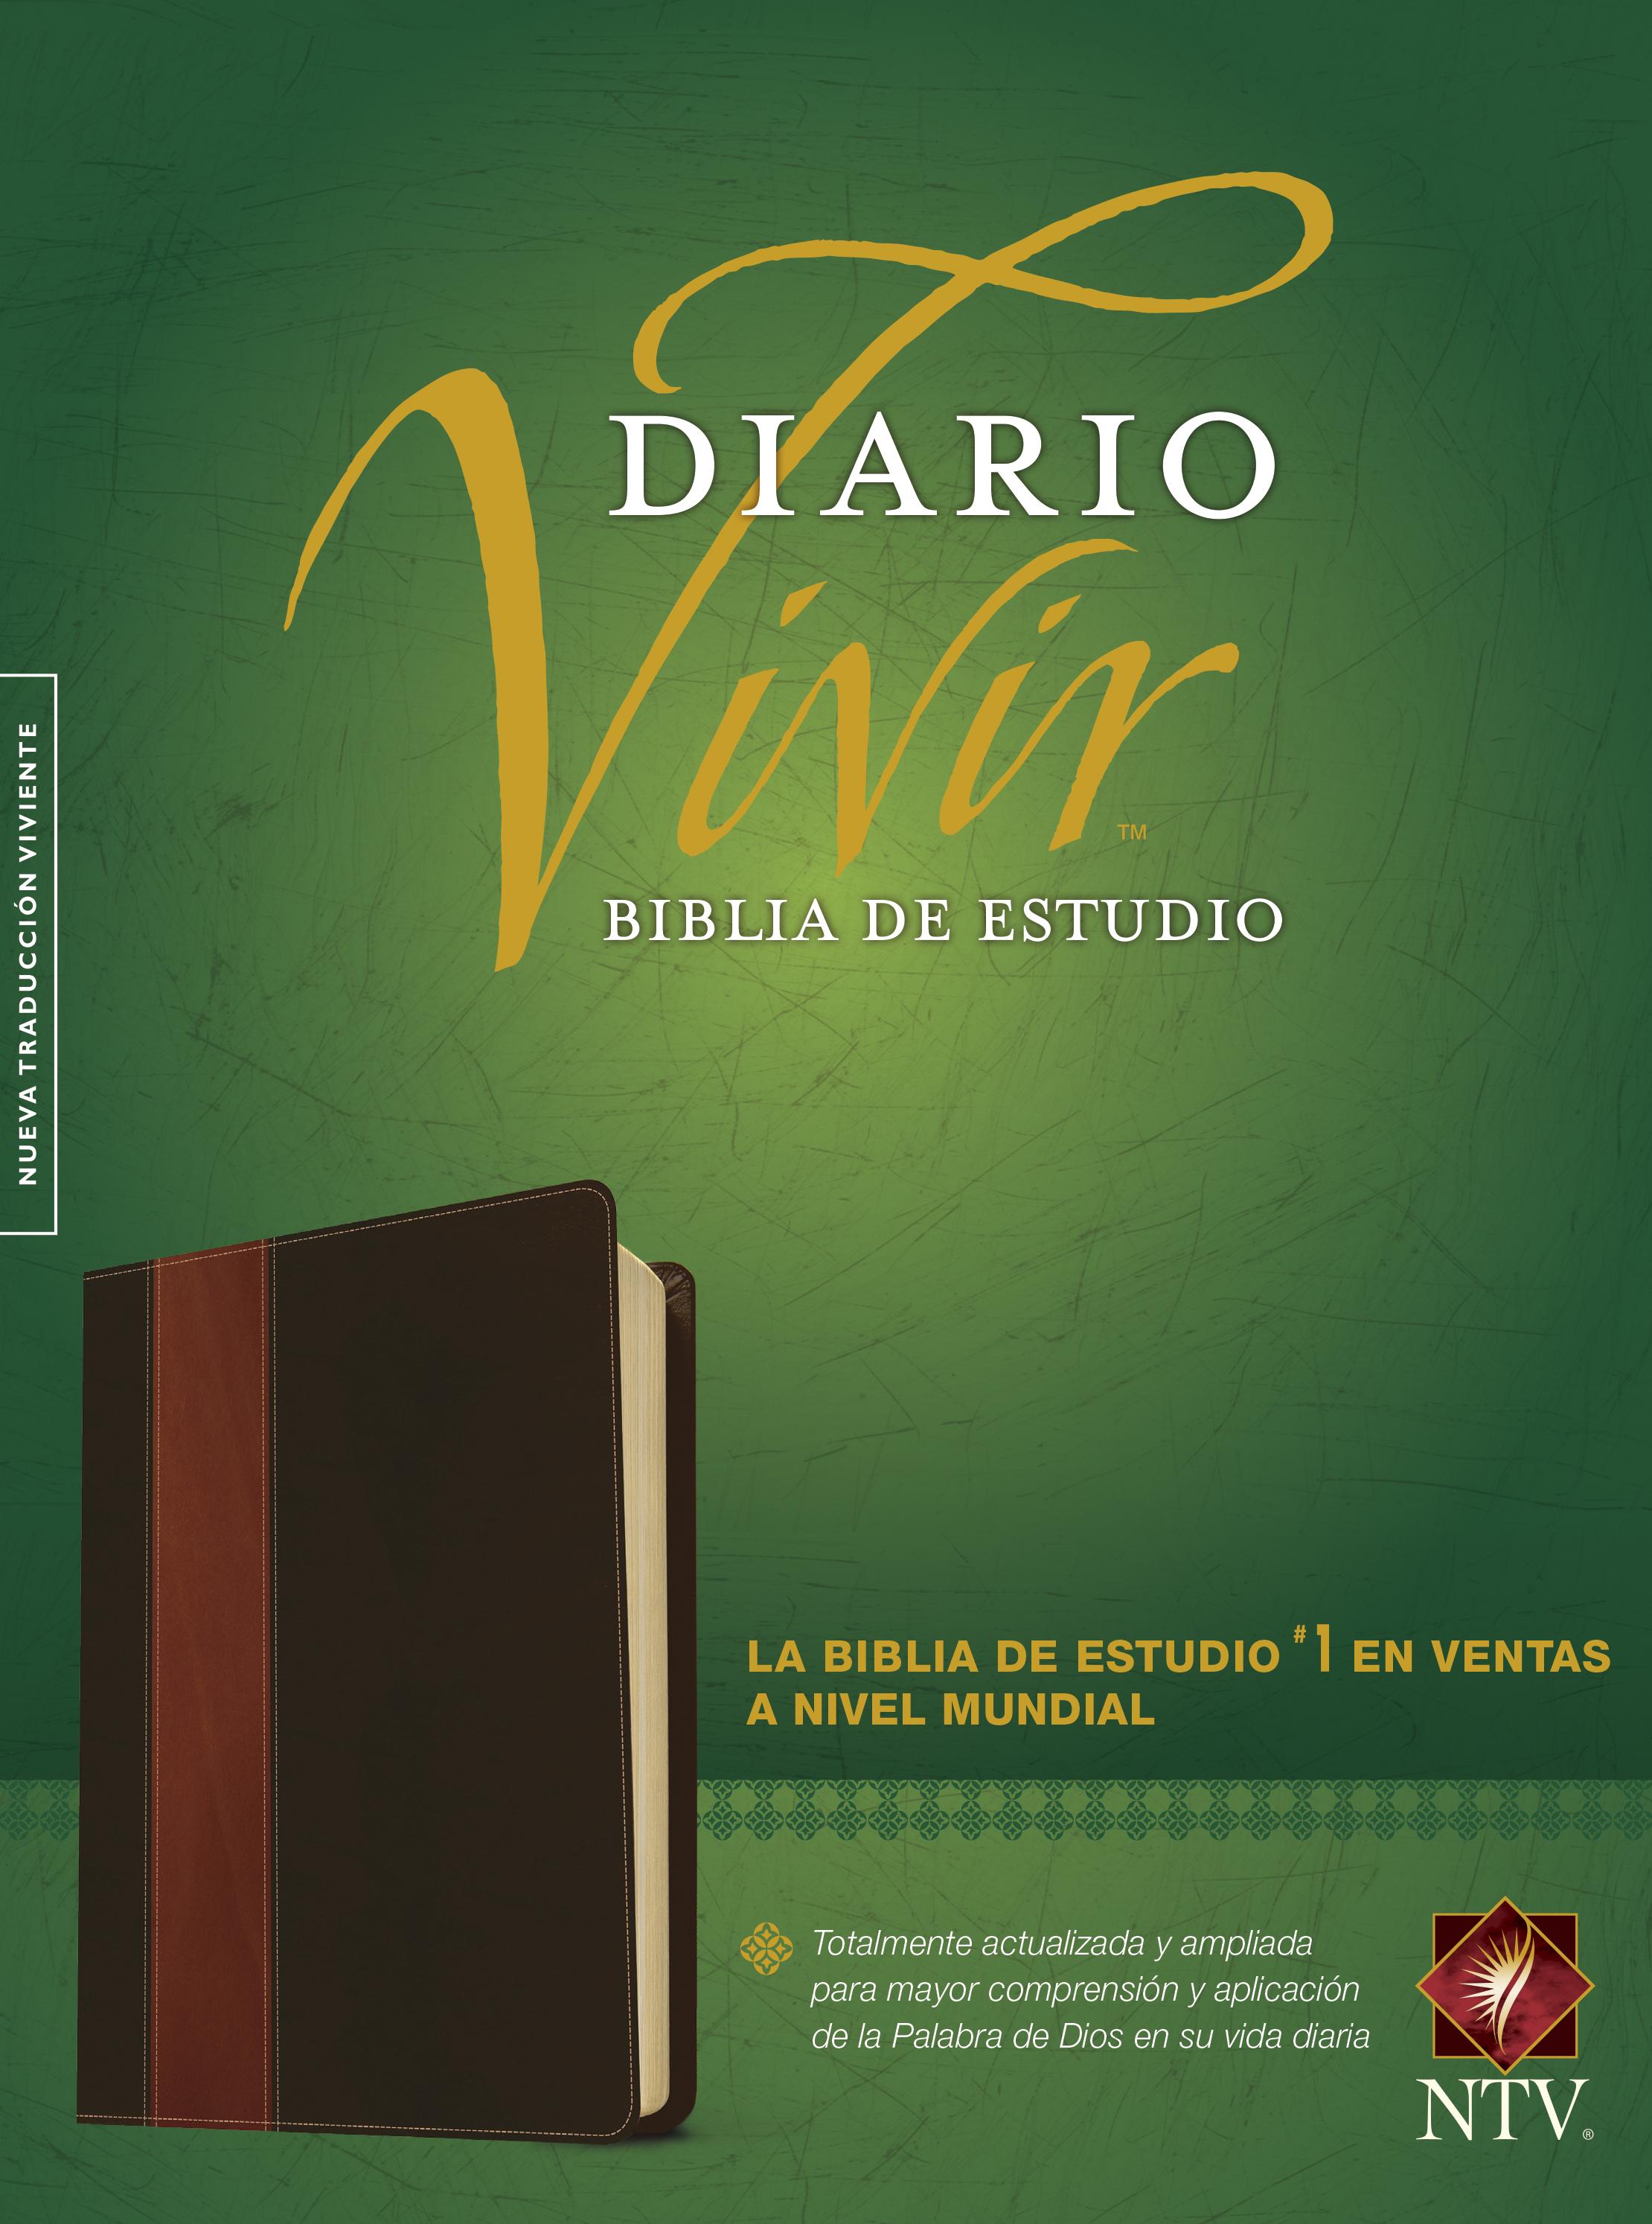 Biblia de estudio del diario vivir NTV (Letra Roja, SentiPiel, Café/Café claro, Índice)